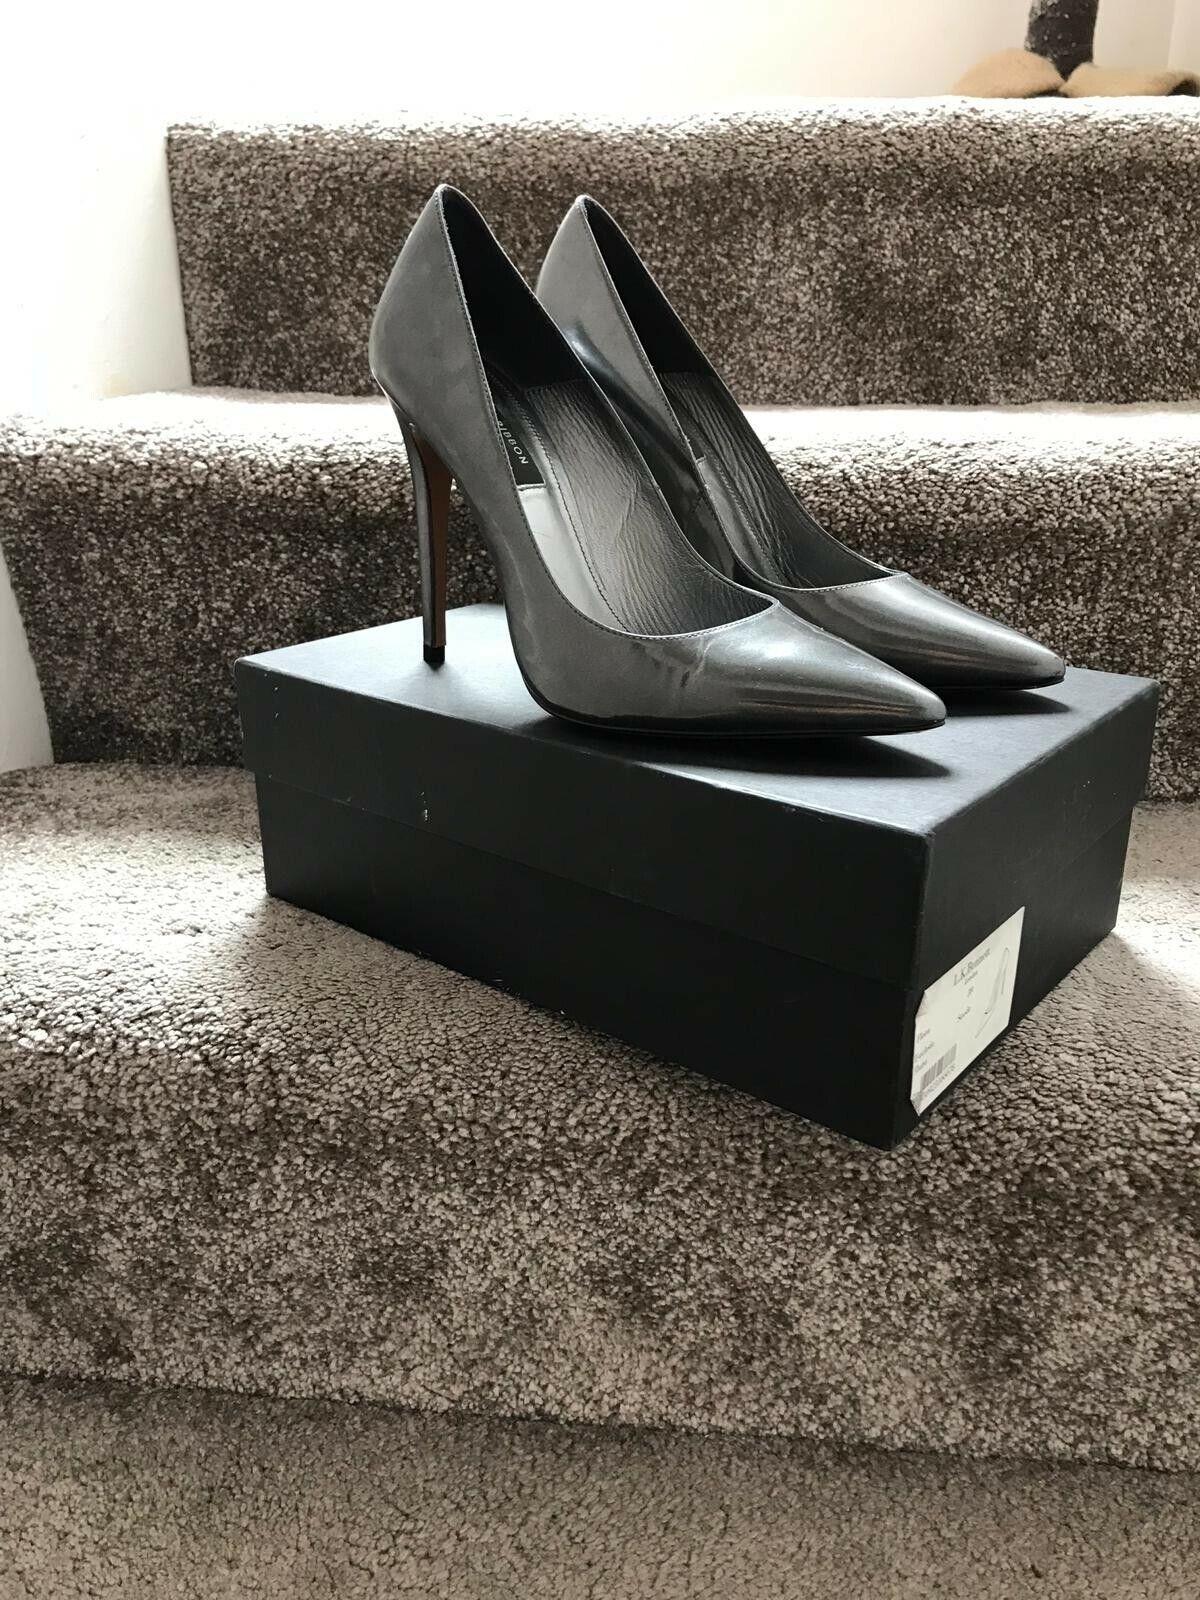 Lk Bennett Black ribbon Court shoes size 40